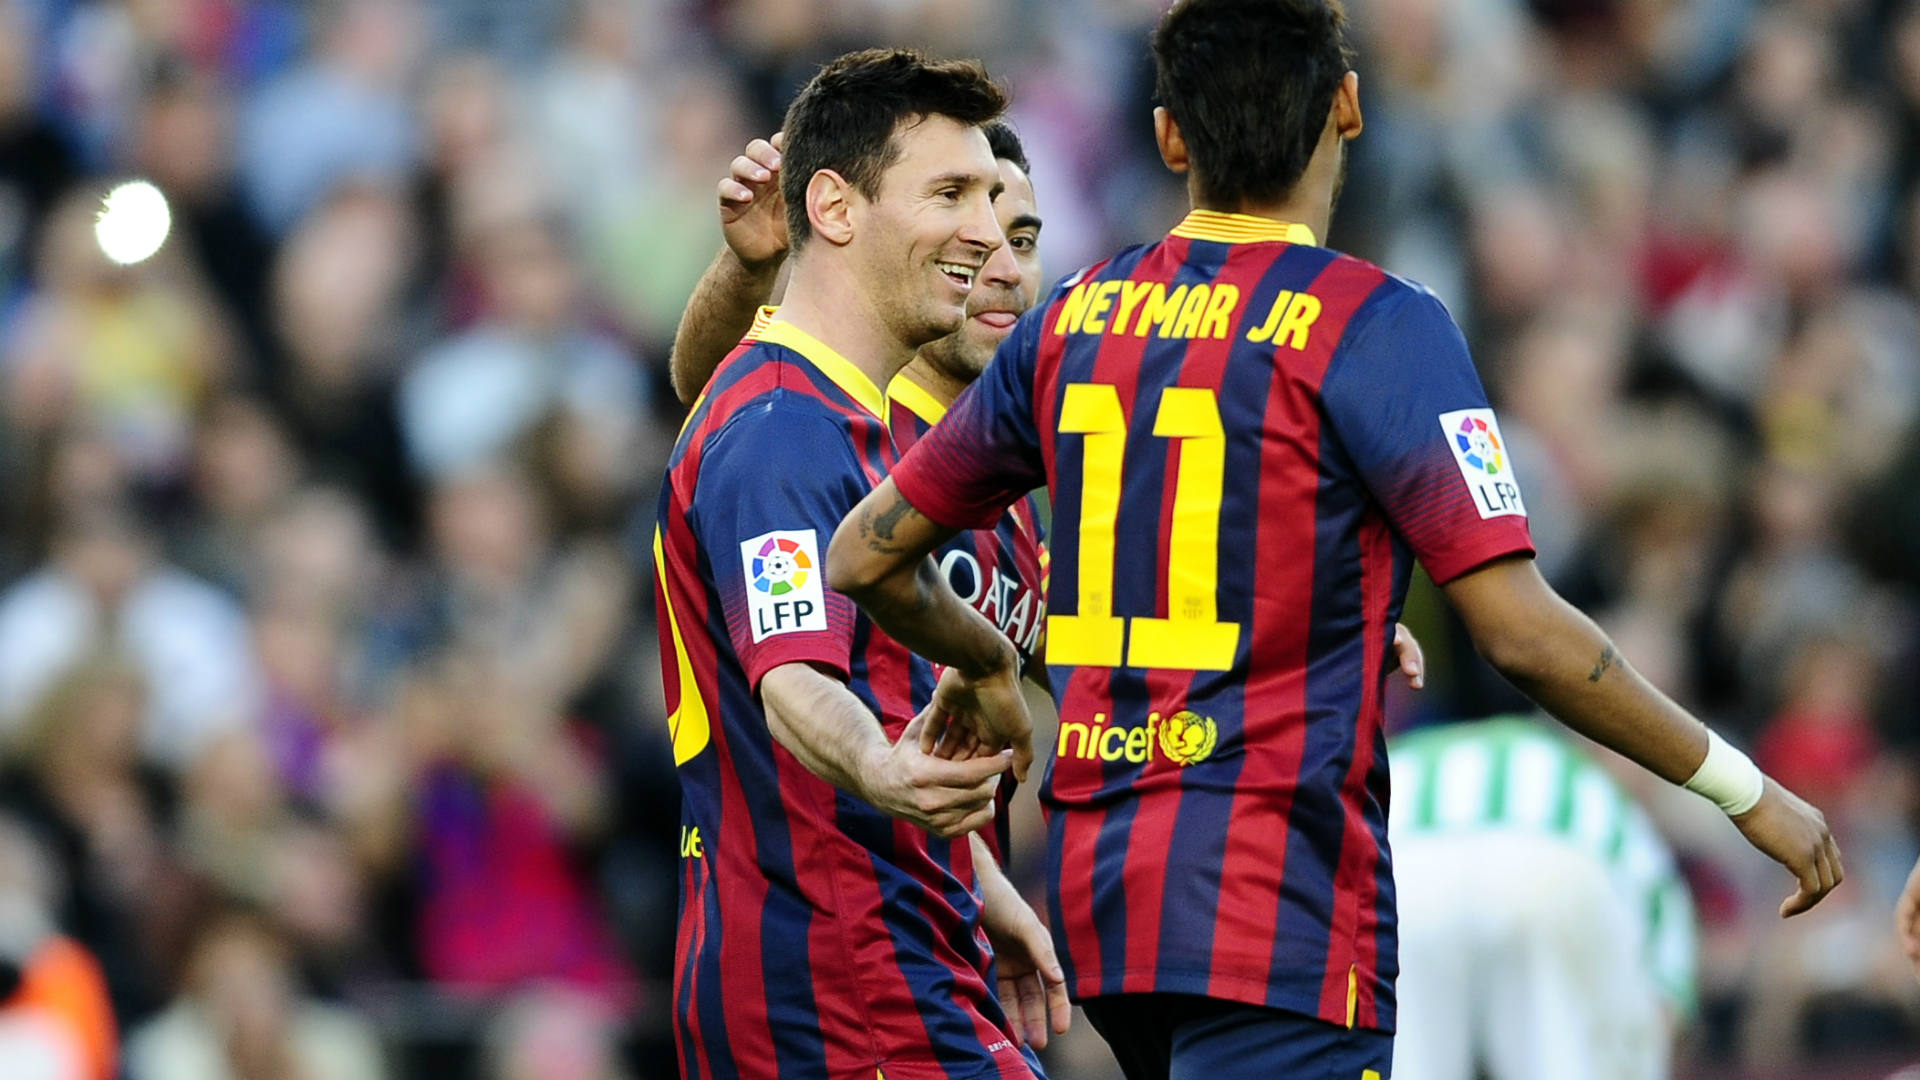 Messi_Neymar_FTR_04052015